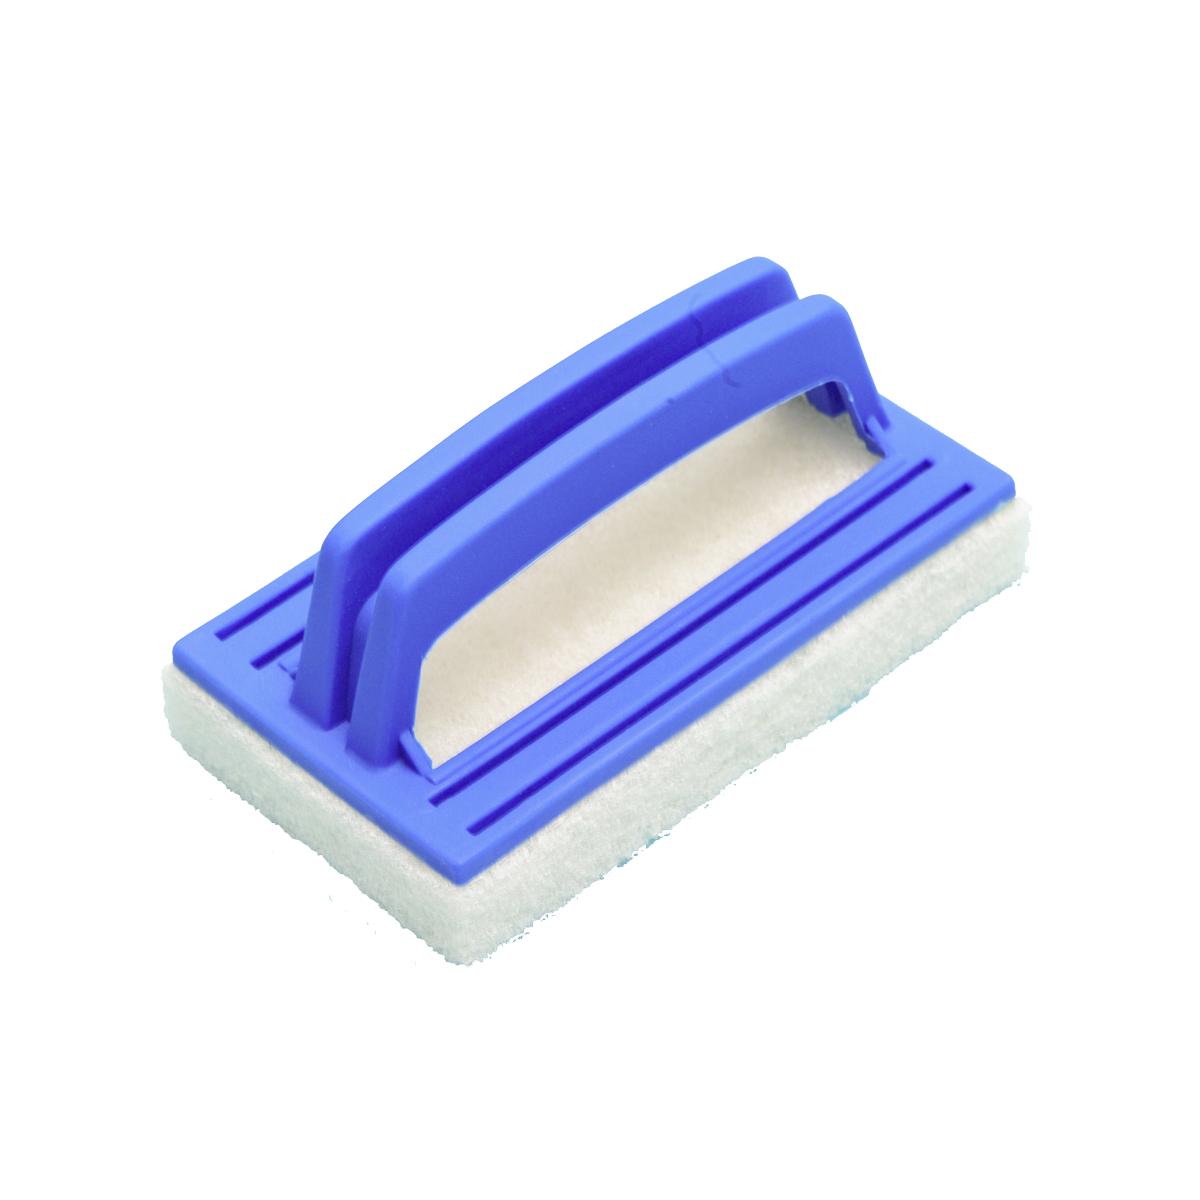 Smart Handschrubber light Handschrubber Smart Einzelverpackung Smart Handschrubber light Handschrubber Smart Einzelverpackung